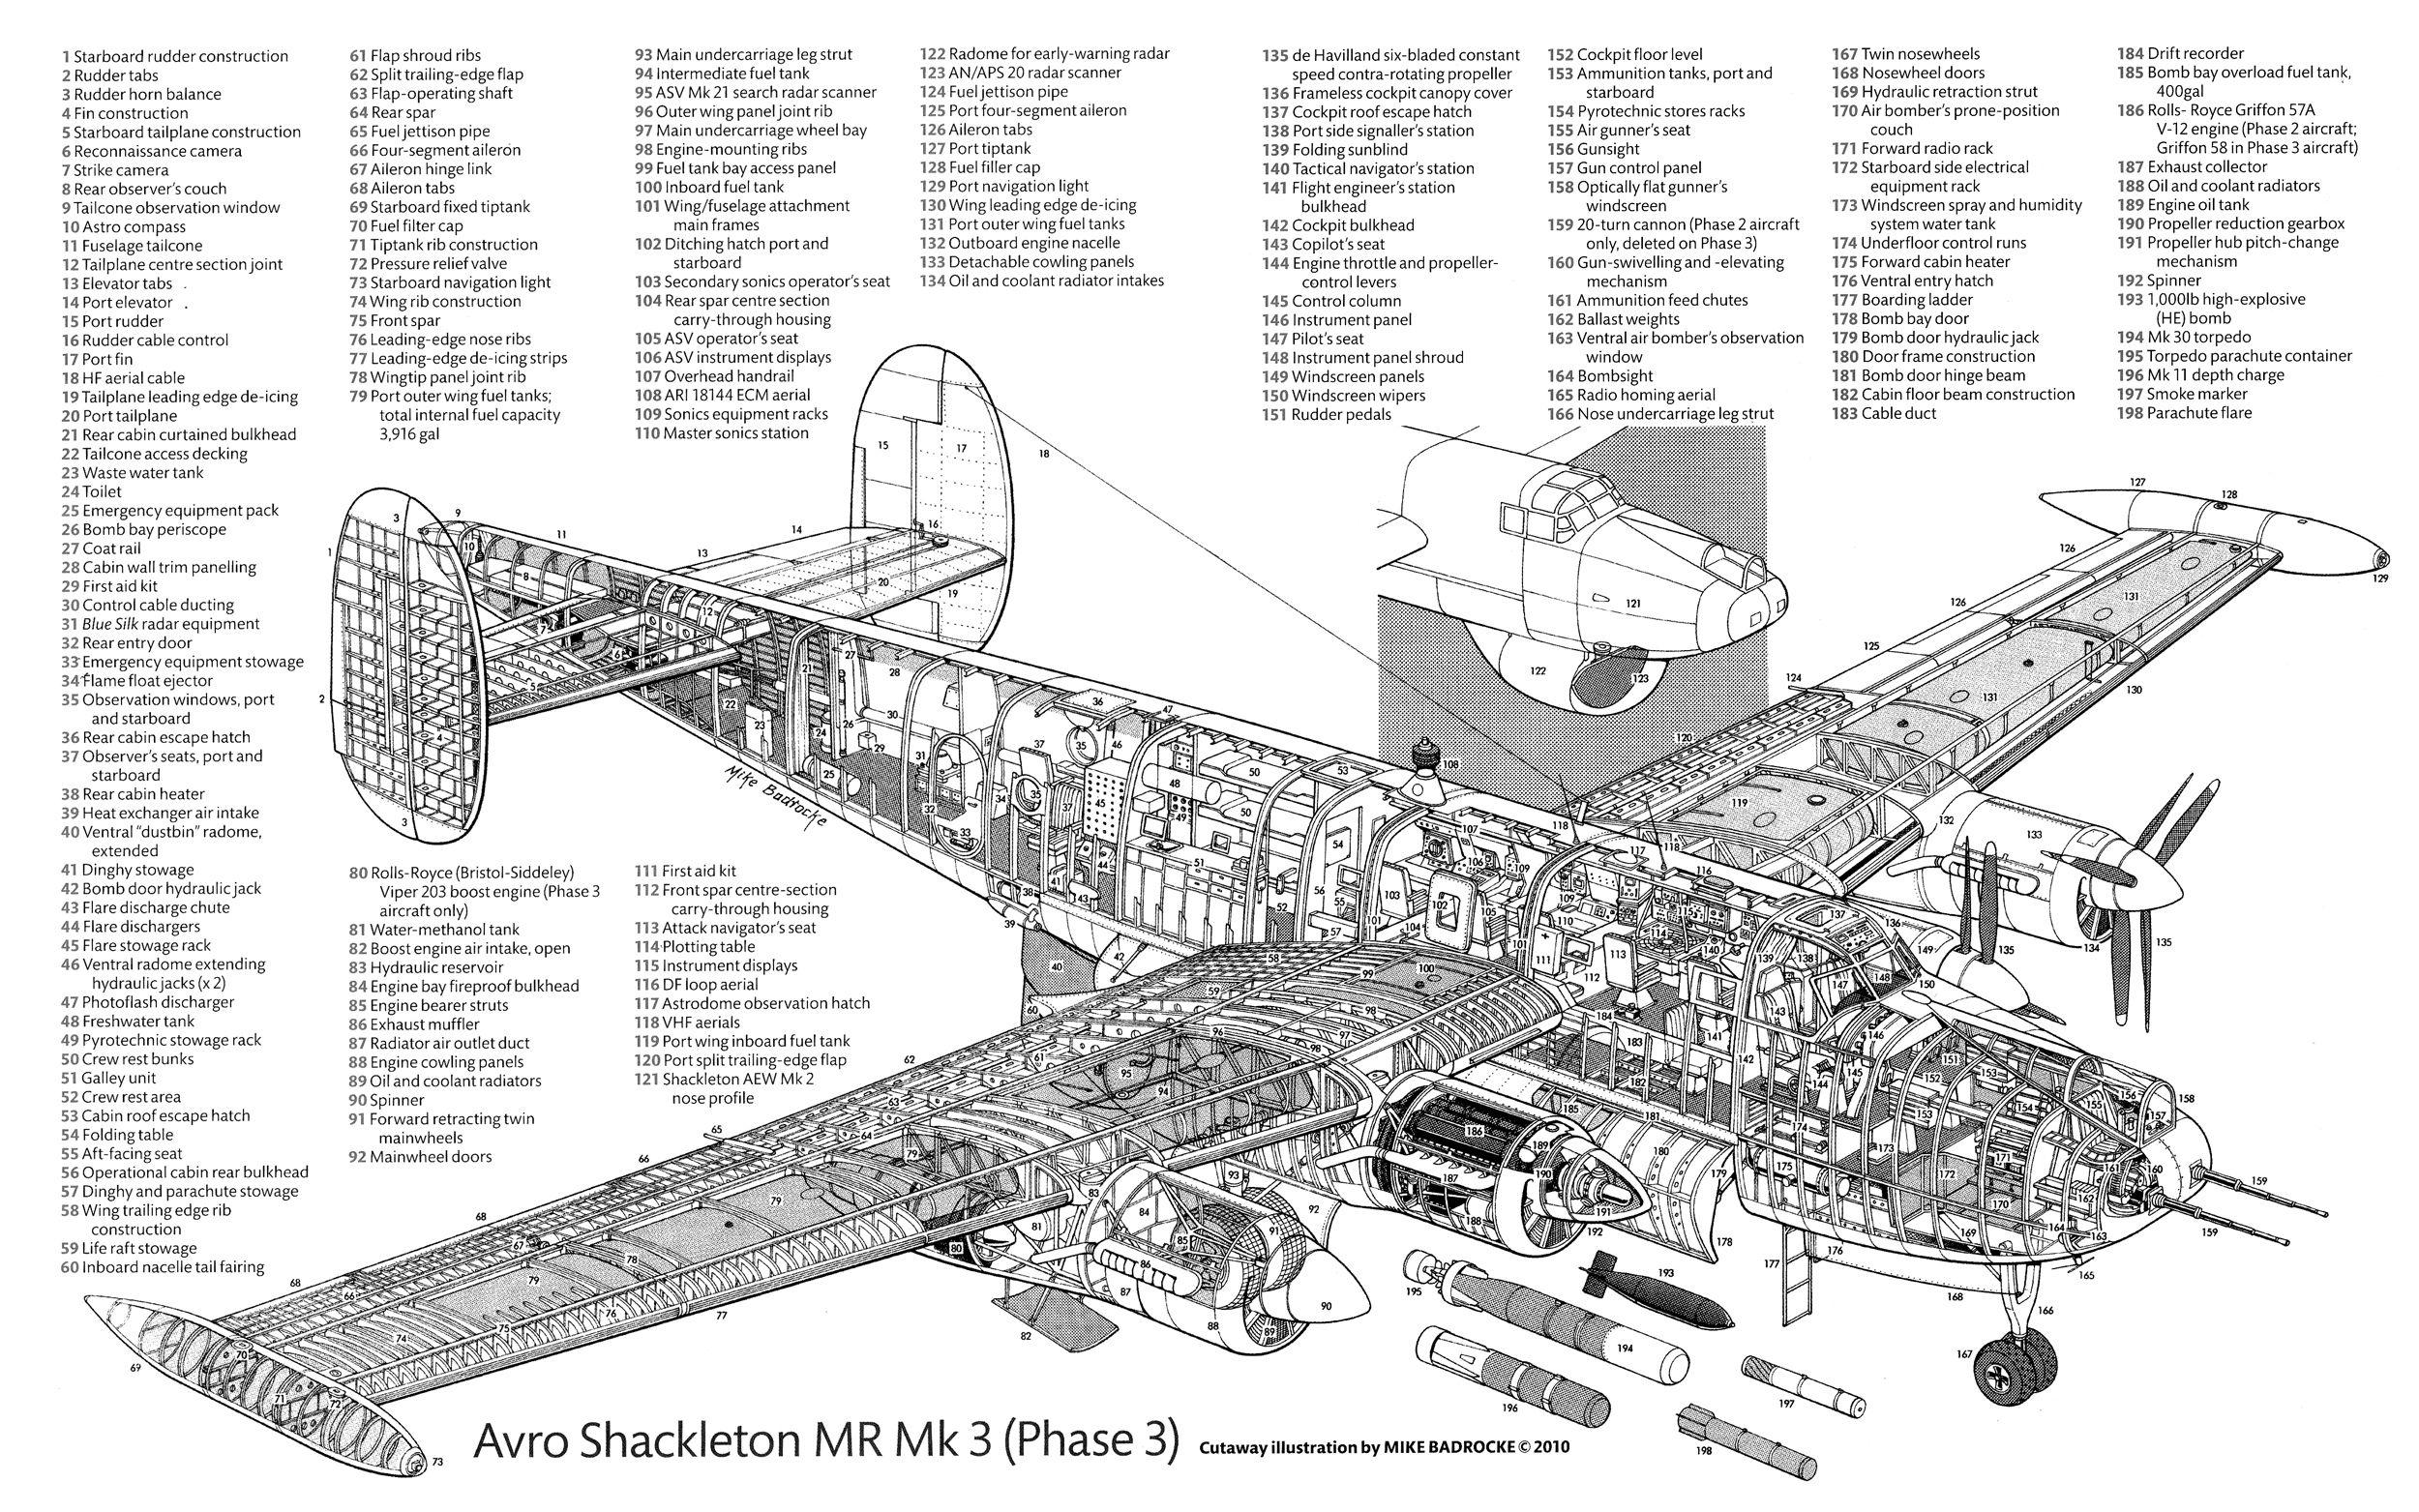 Avro Shackletonm Mk 3 | Anatomia Aviónica | Pinterest | Drawing, 3d ...